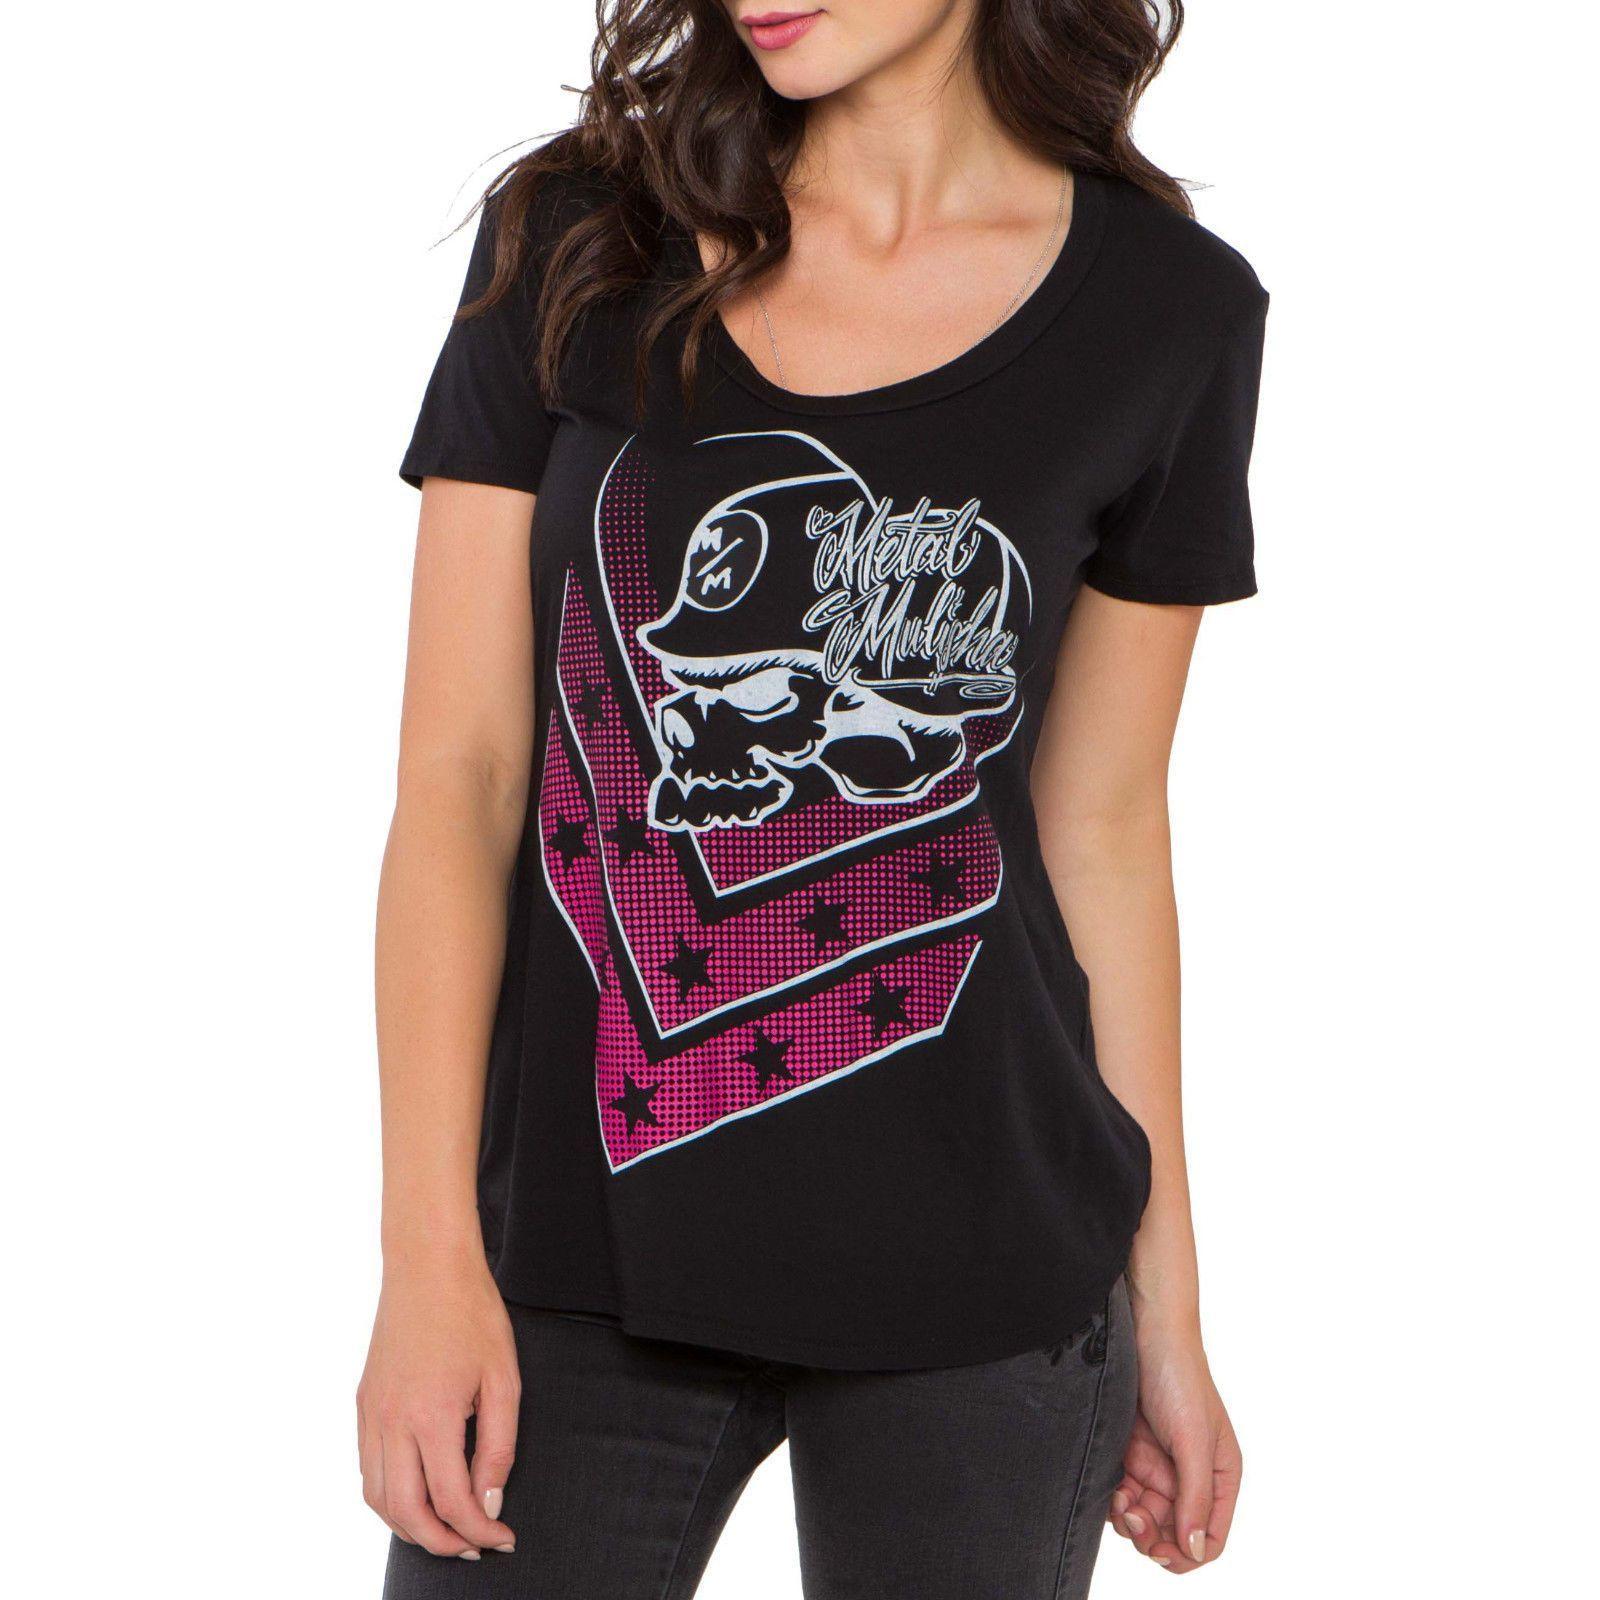 5c063b92 Metal Mulisha Womens Corey Scoop Jet Black Skull Helmet Logo Scoop Neck T- Shirt